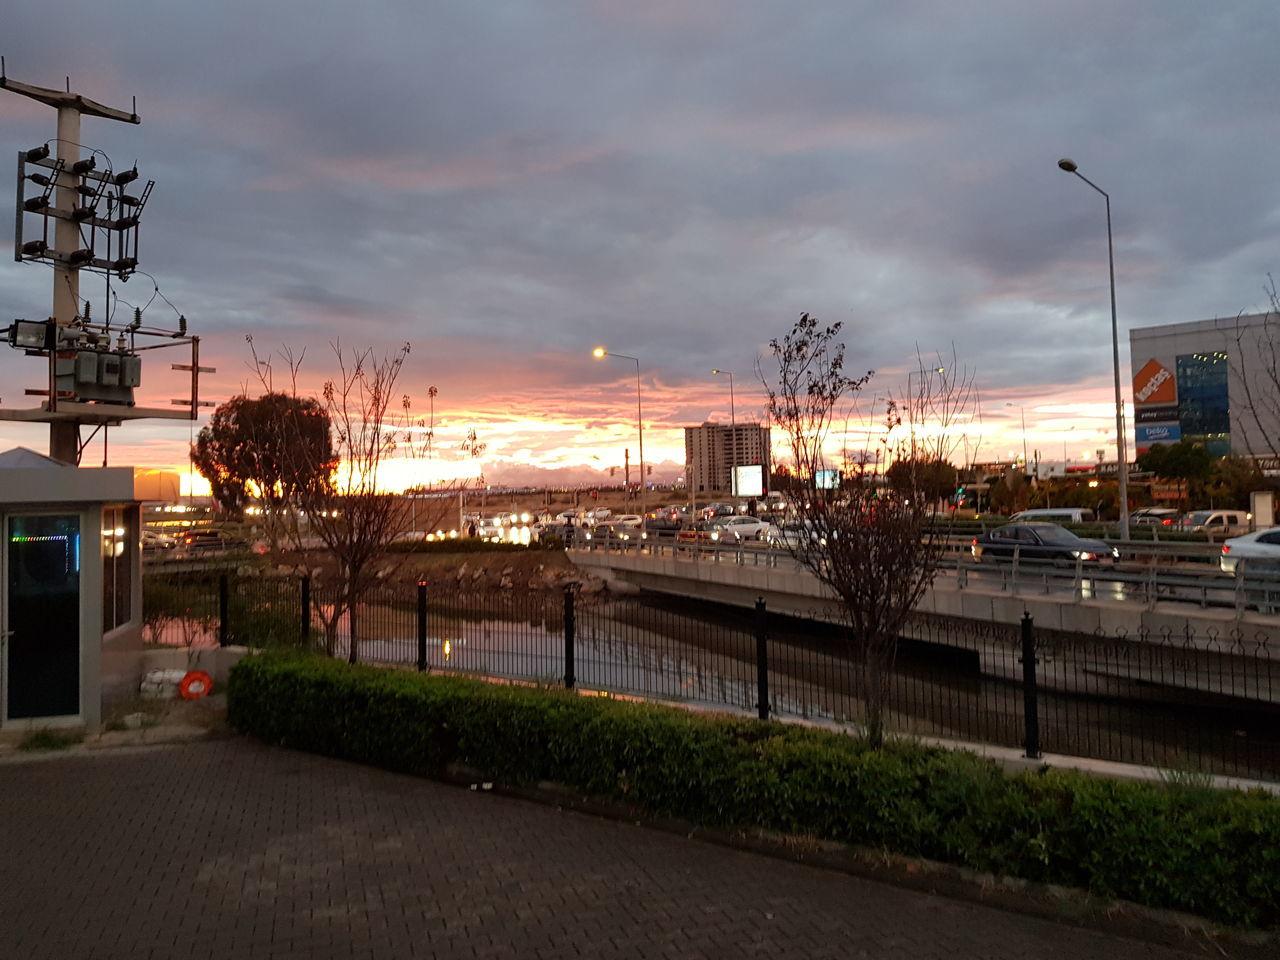 sky, cloud - sky, architecture, sunset, built structure, building exterior, city, transportation, nature, plant, illuminated, street, dusk, no people, tree, street light, road, mode of transportation, outdoors, car